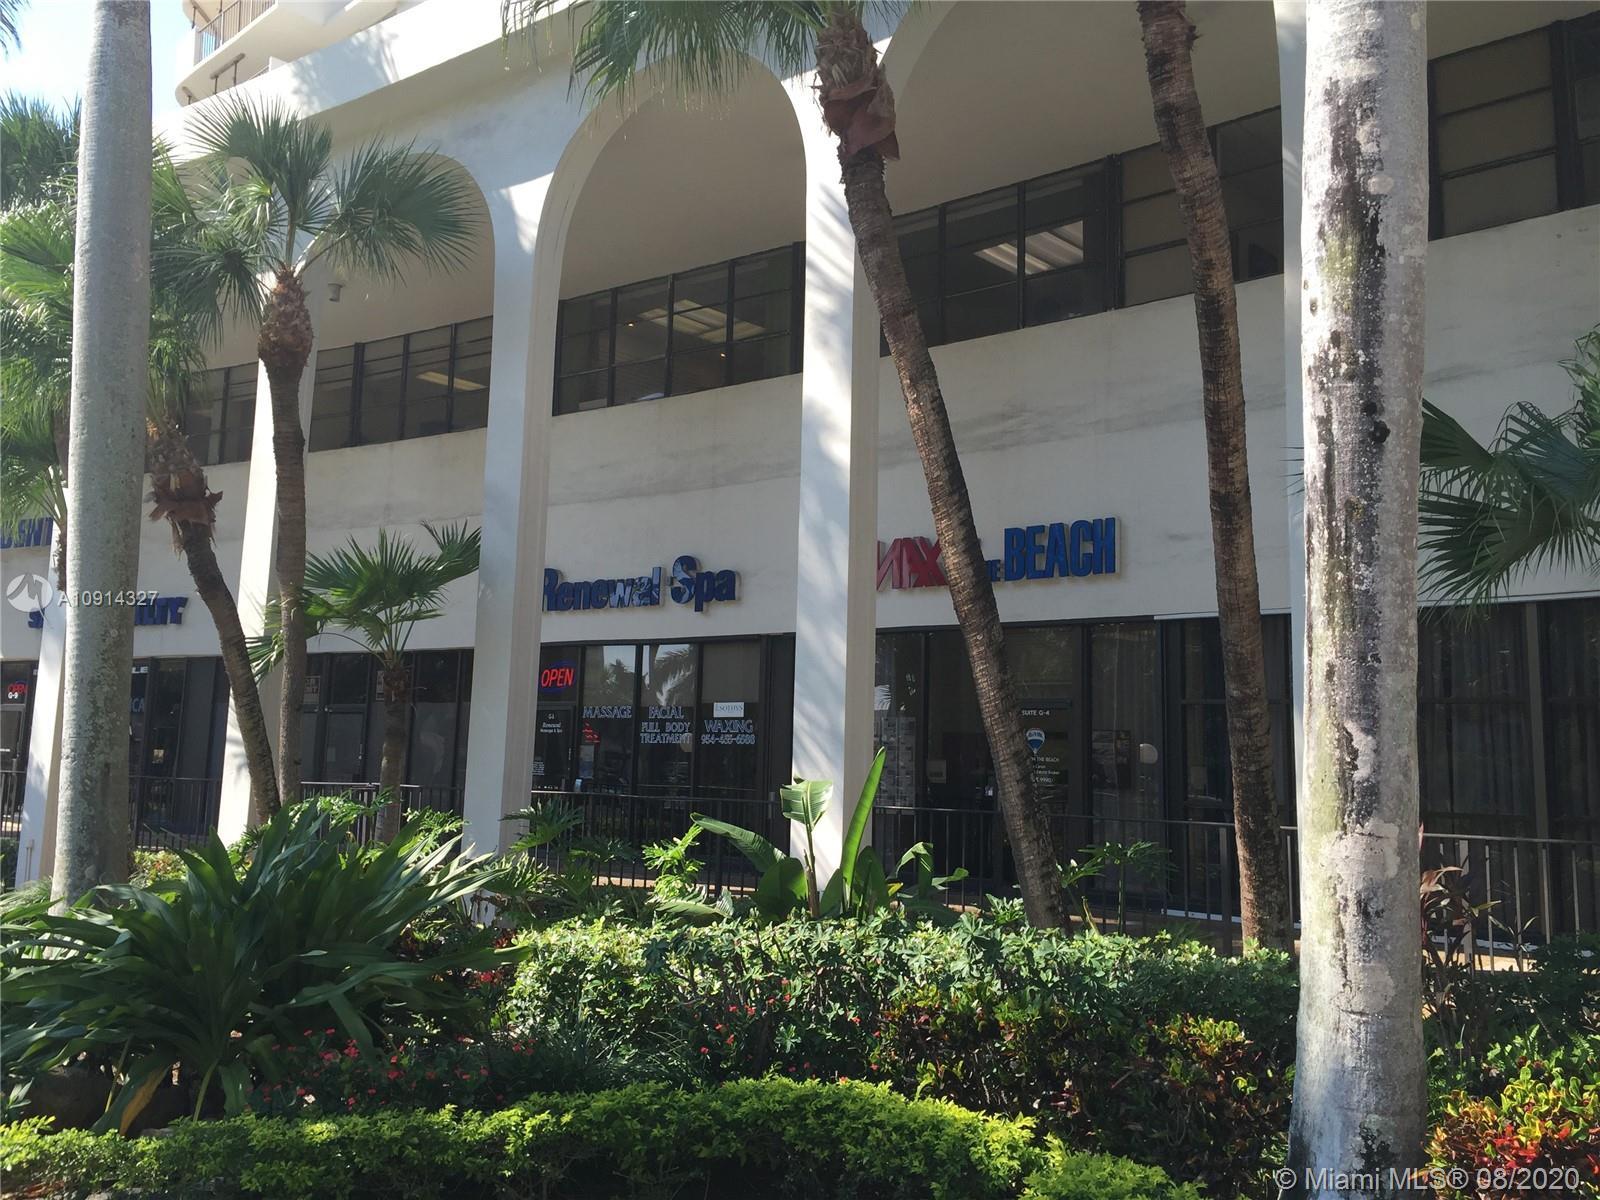 Hallmark of Hollywood #242 - 3800 S Ocean Dr #242, Hollywood, FL 33019